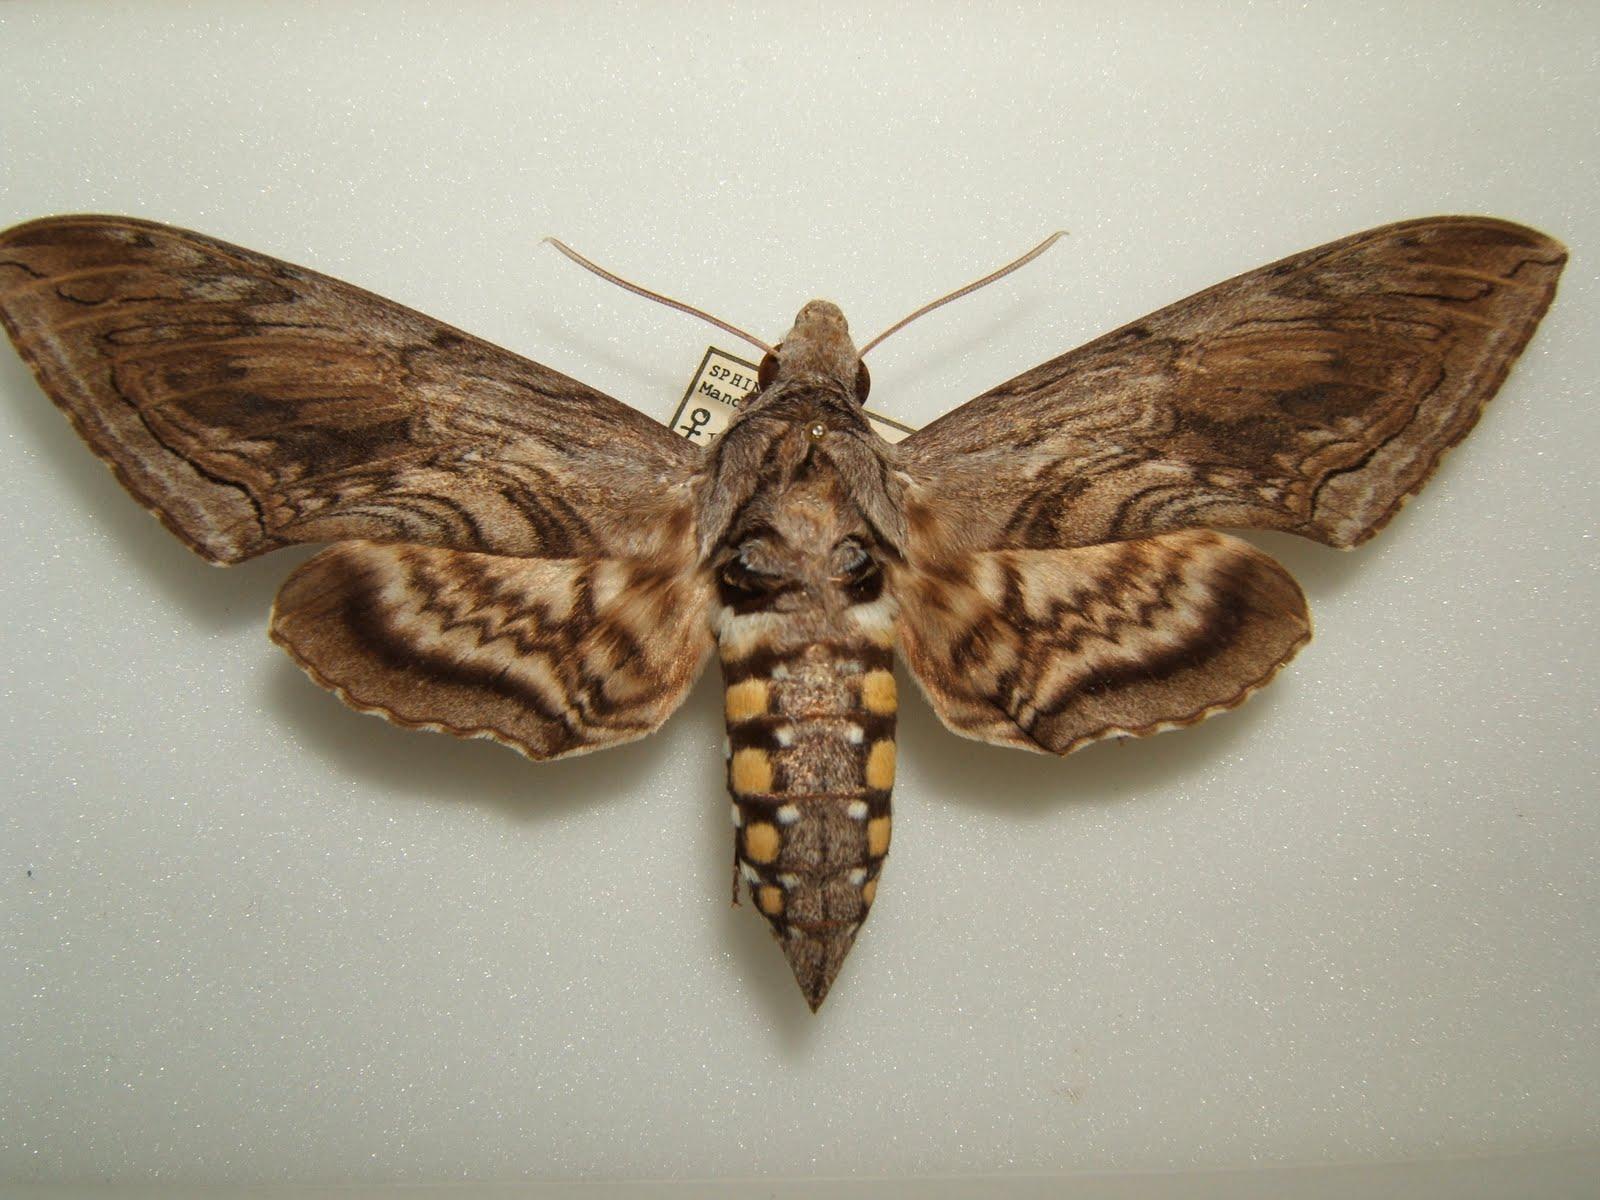 Hornworm Moth Life Cycle To control tomato hornworm